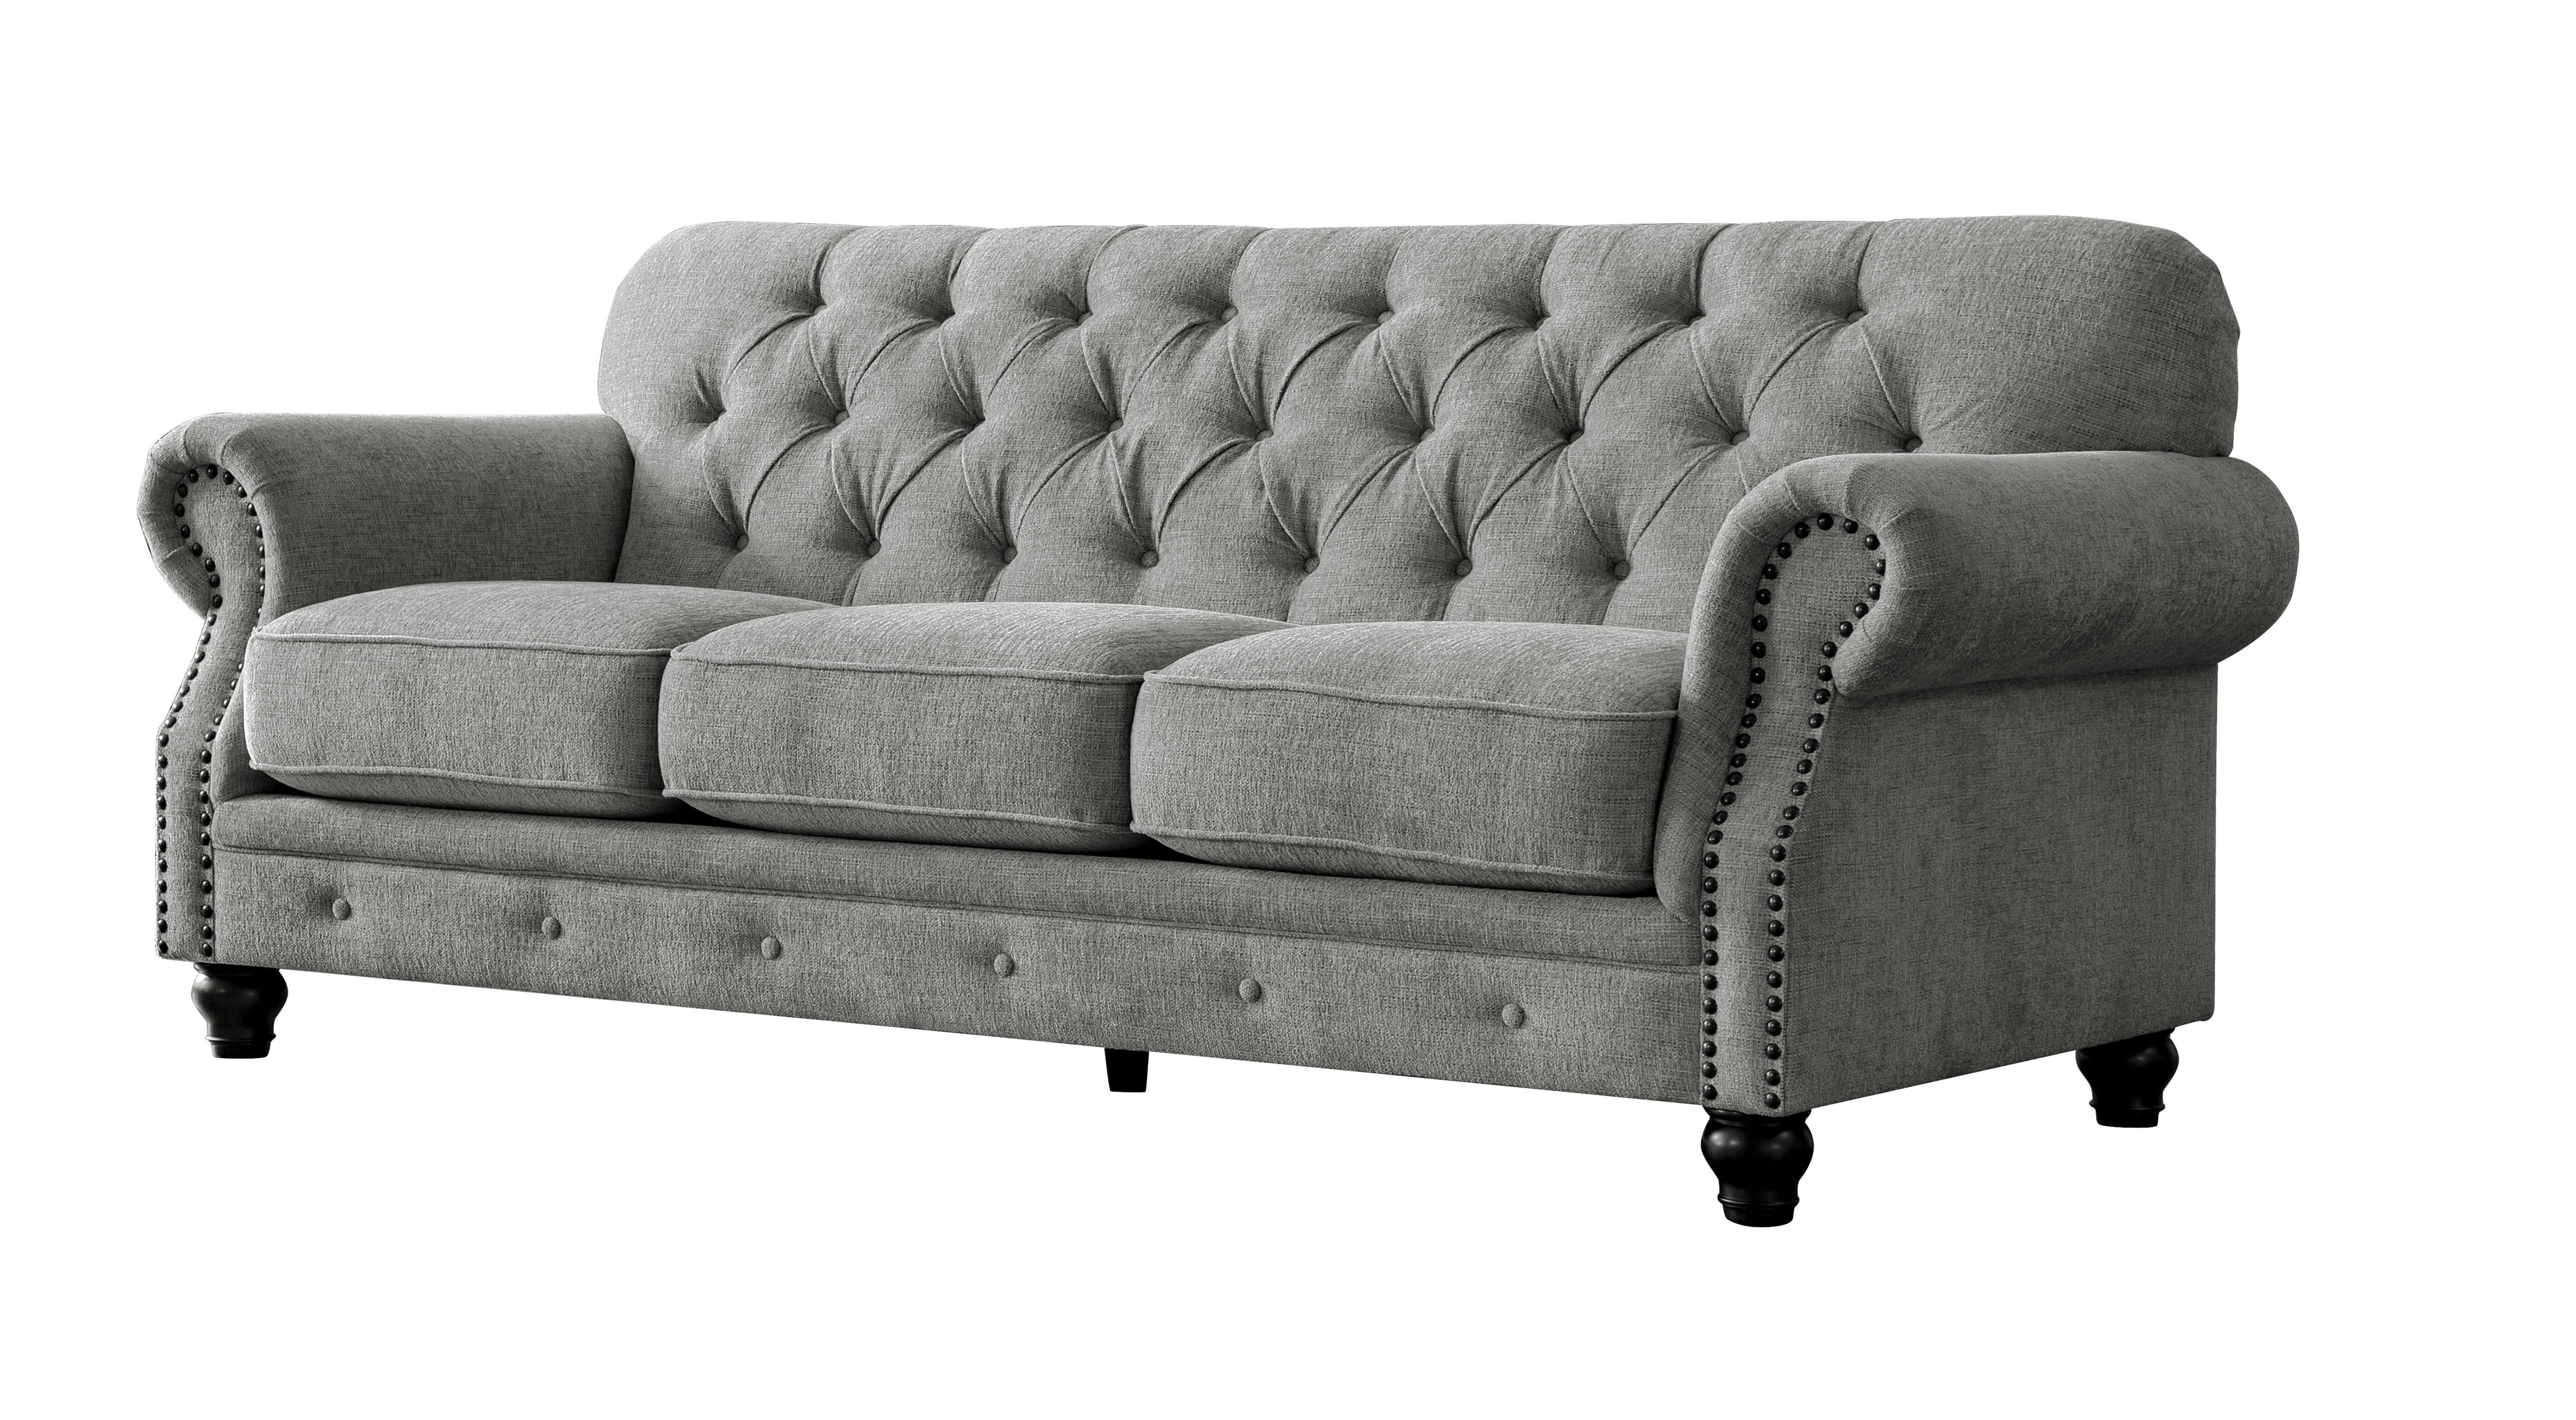 Unmade Medium Couch